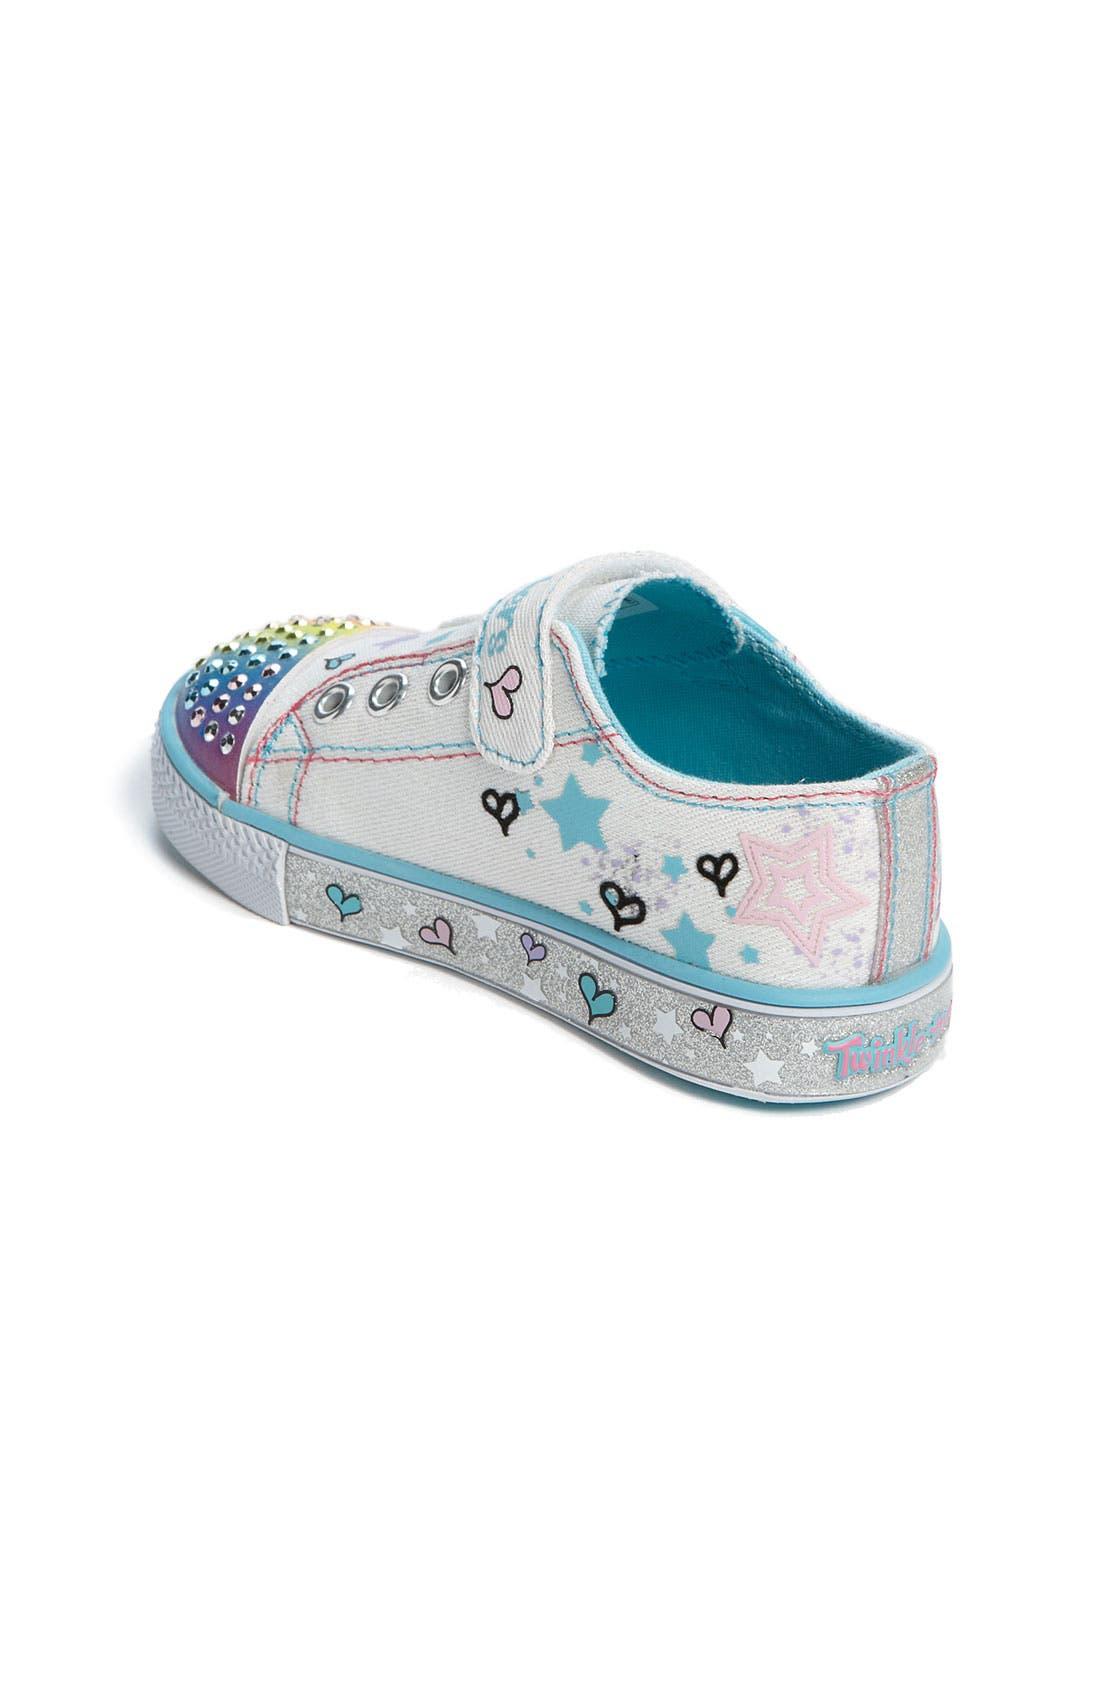 Alternate Image 2  - SKECHERS 'Peekaboo' Sneaker (Walker & Toddler)